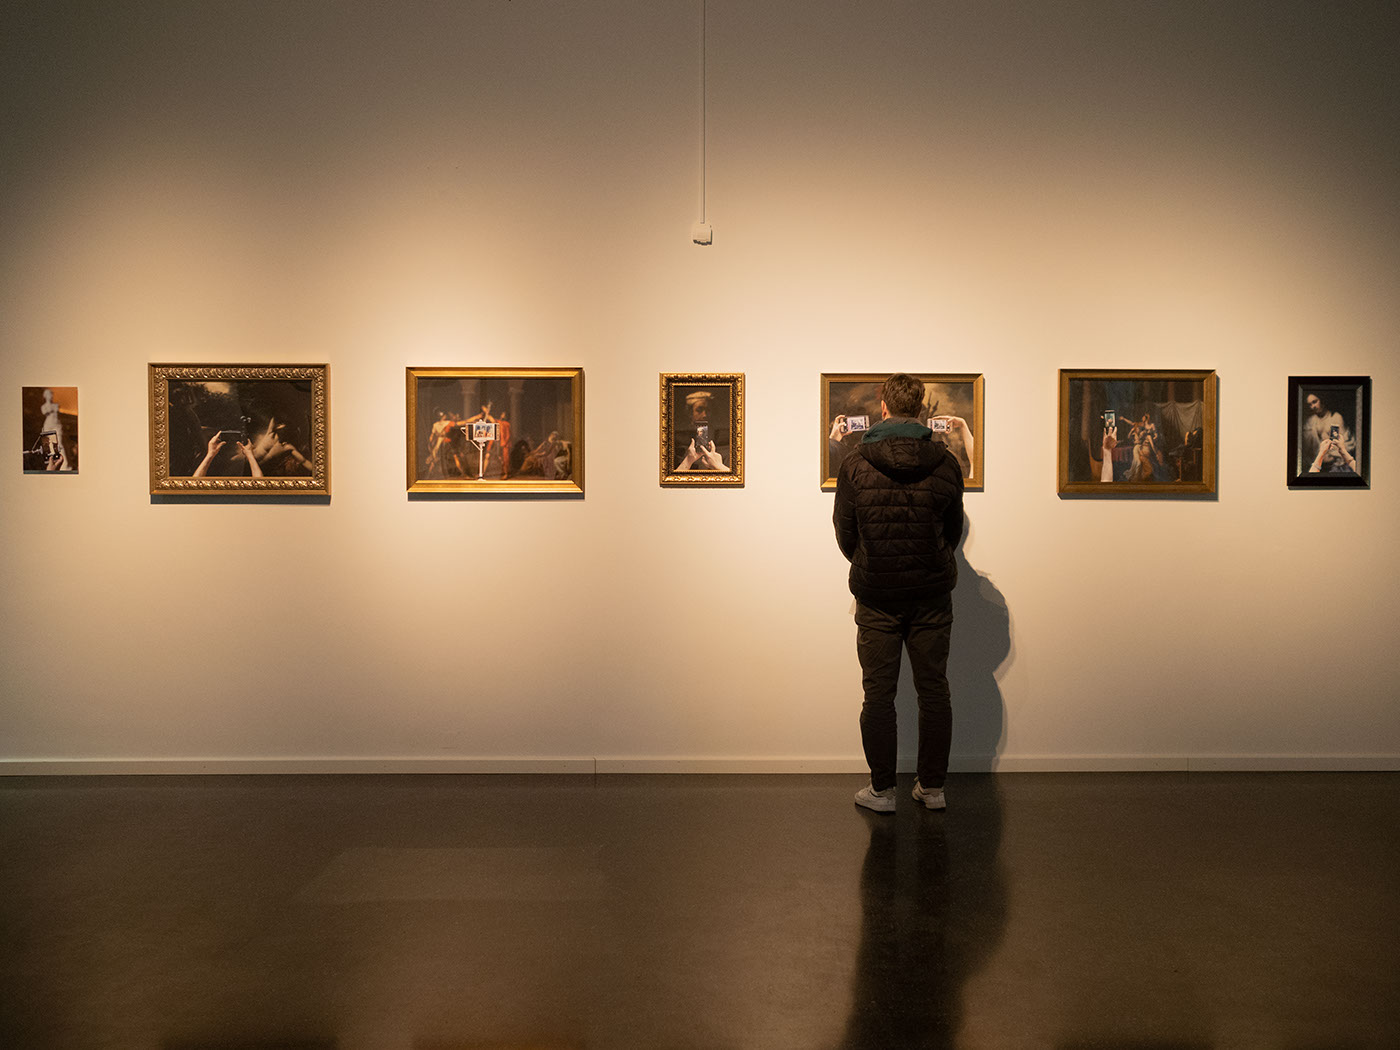 All Art is Photography, Biennale fur Aktuelle Fotografie, Kunstverein Ludwigshafen